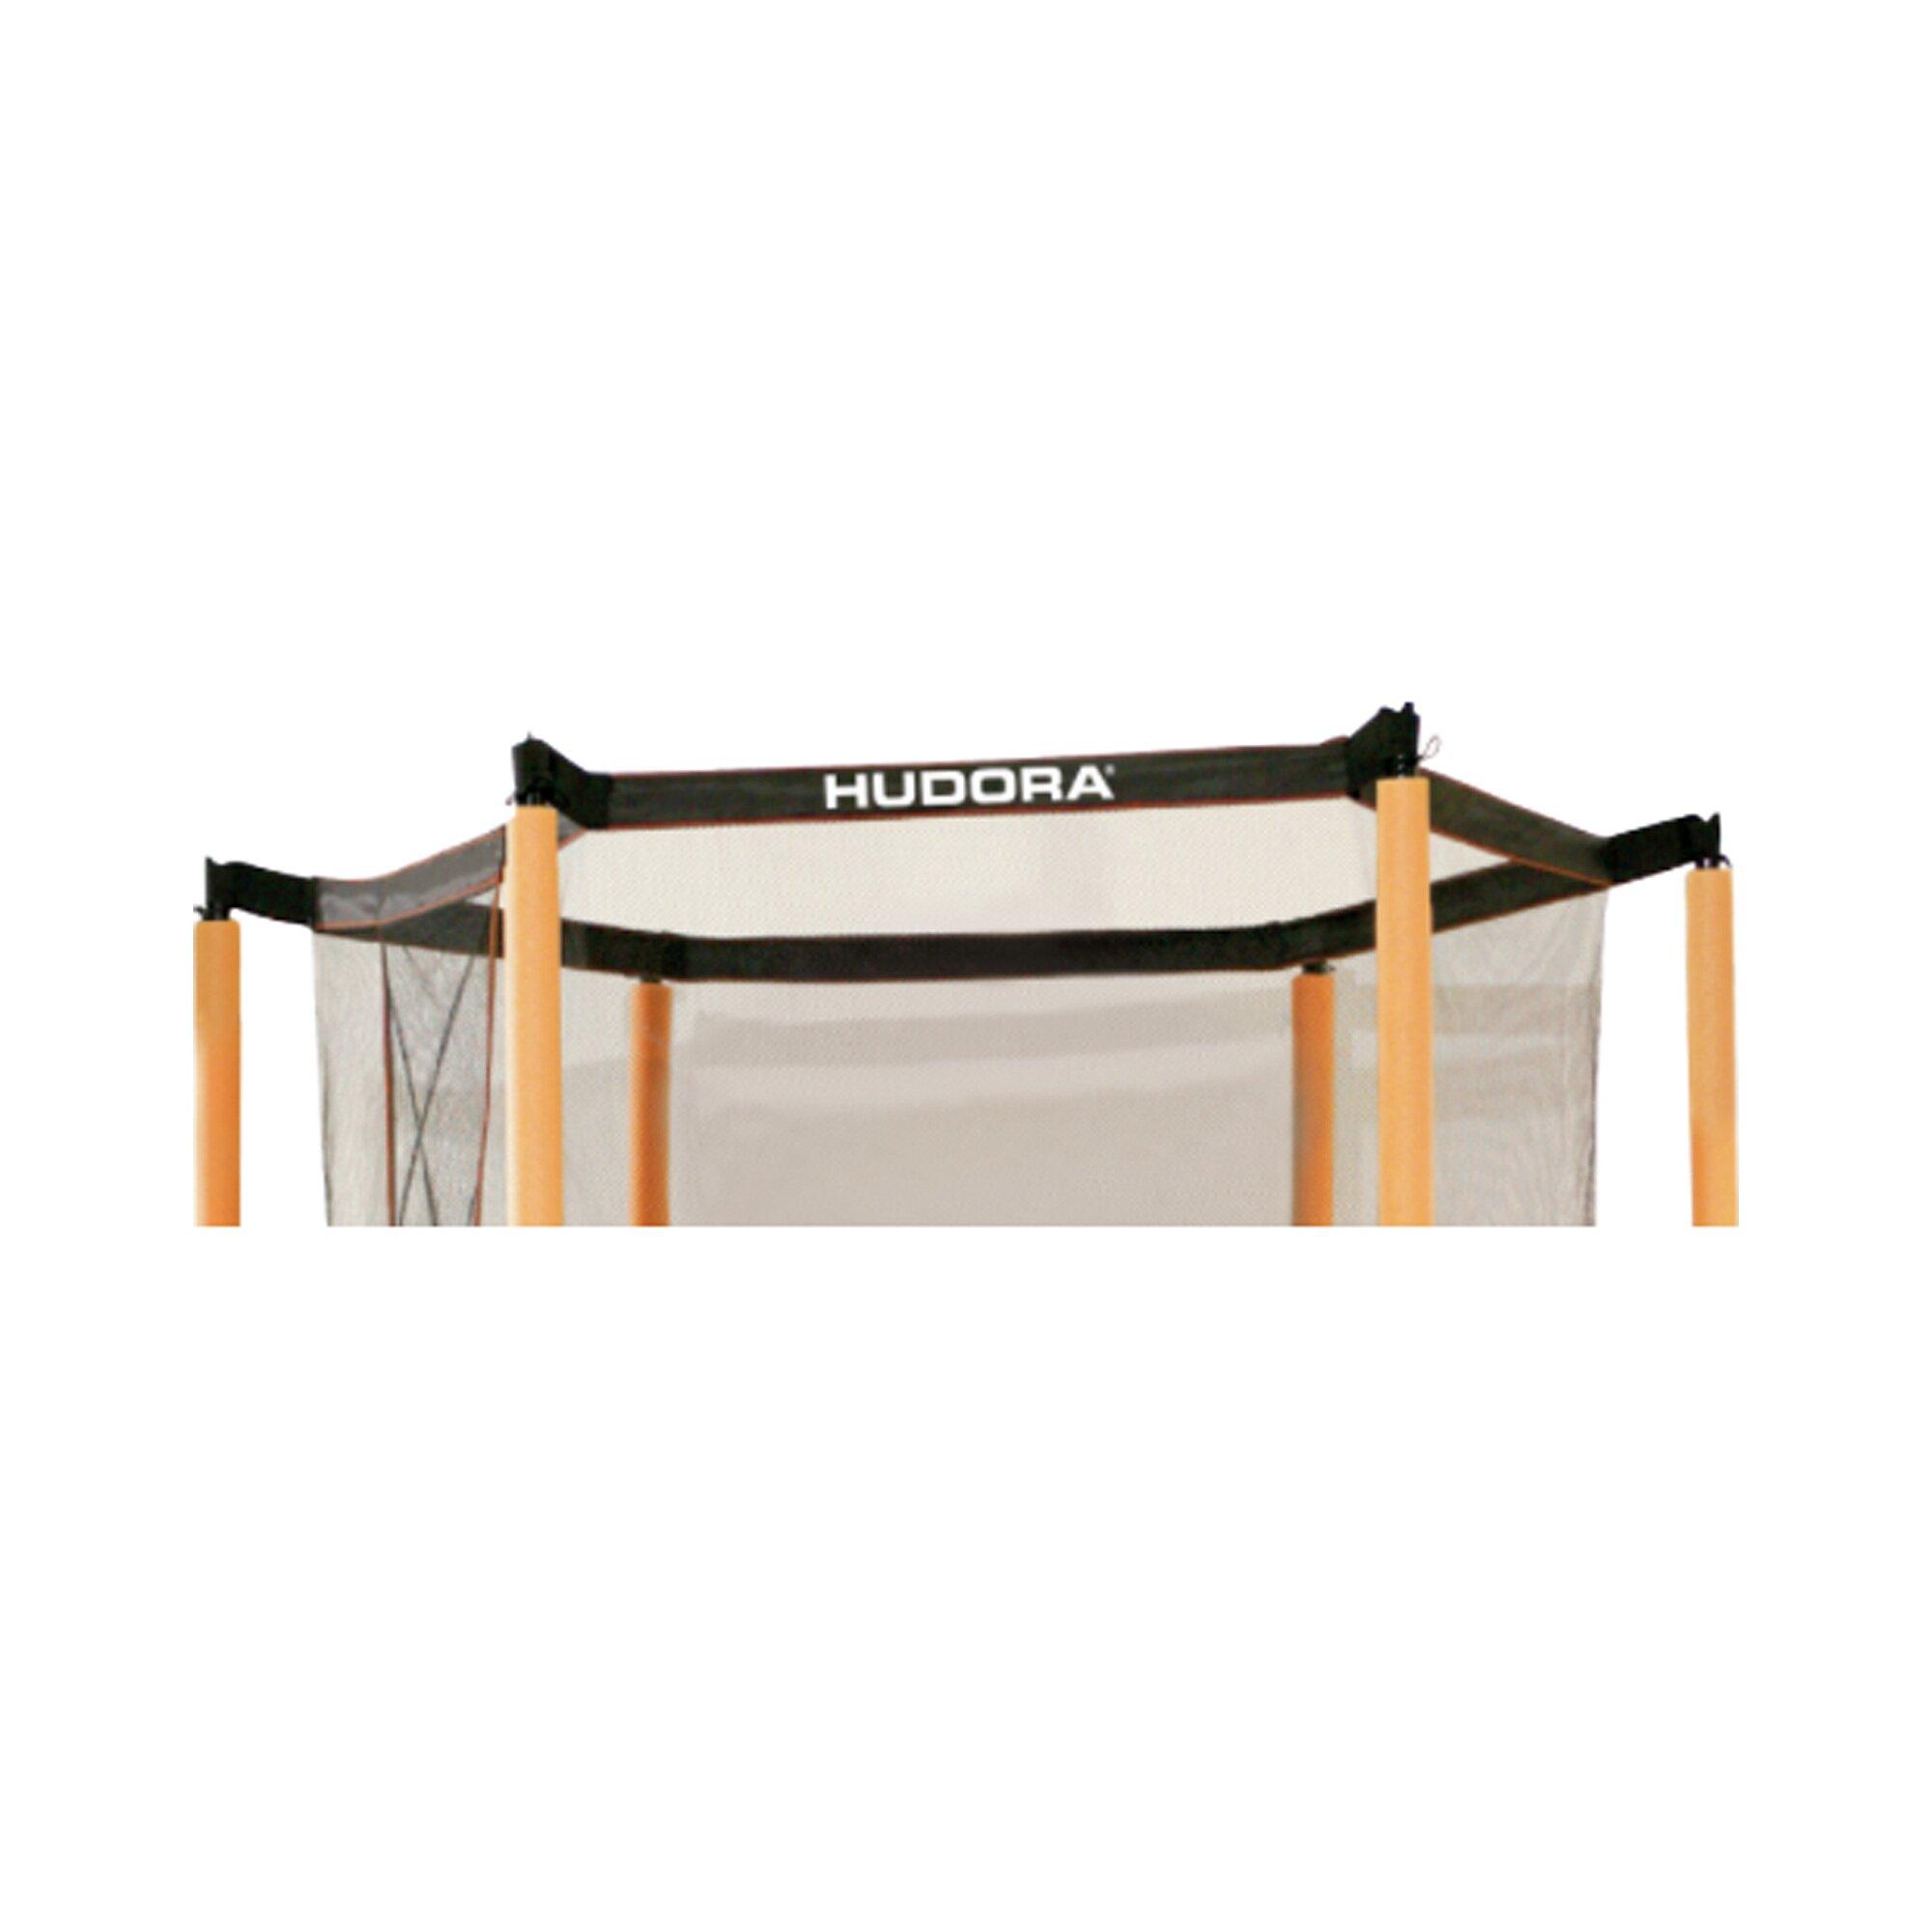 hudora-sicherheitstrampolin-joey-jumo-3-0